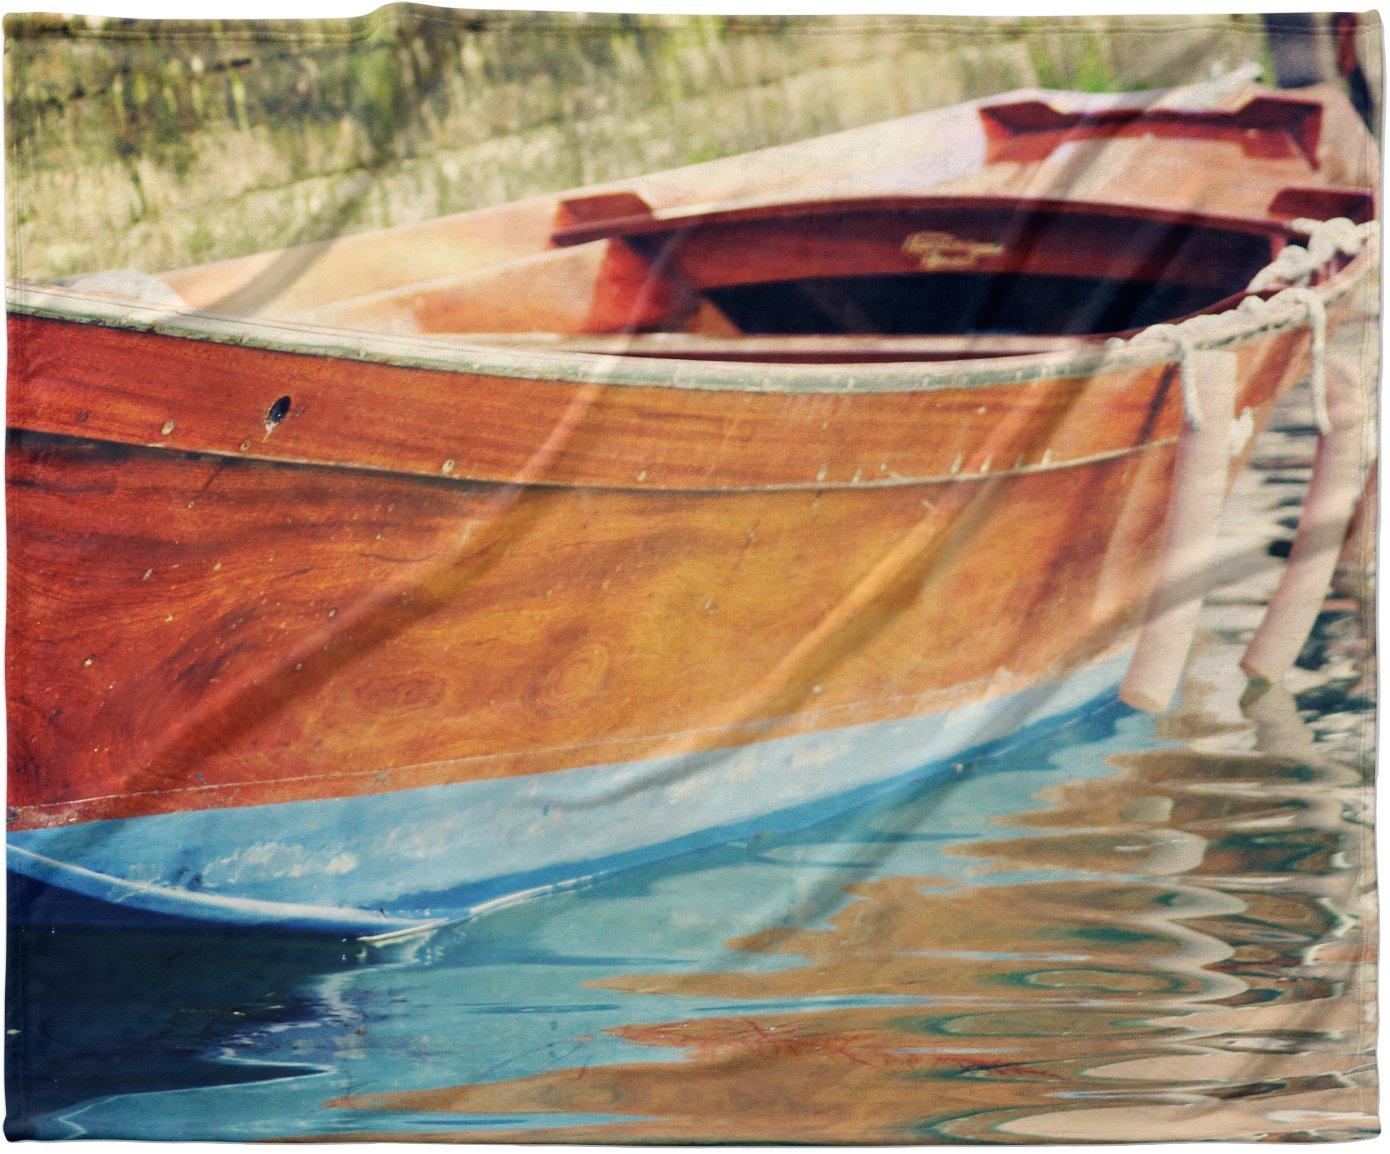 40 x 30 KESS InHouse Sylvia Coomes Venetian Boat Blue Brown Fleece Baby Blanket